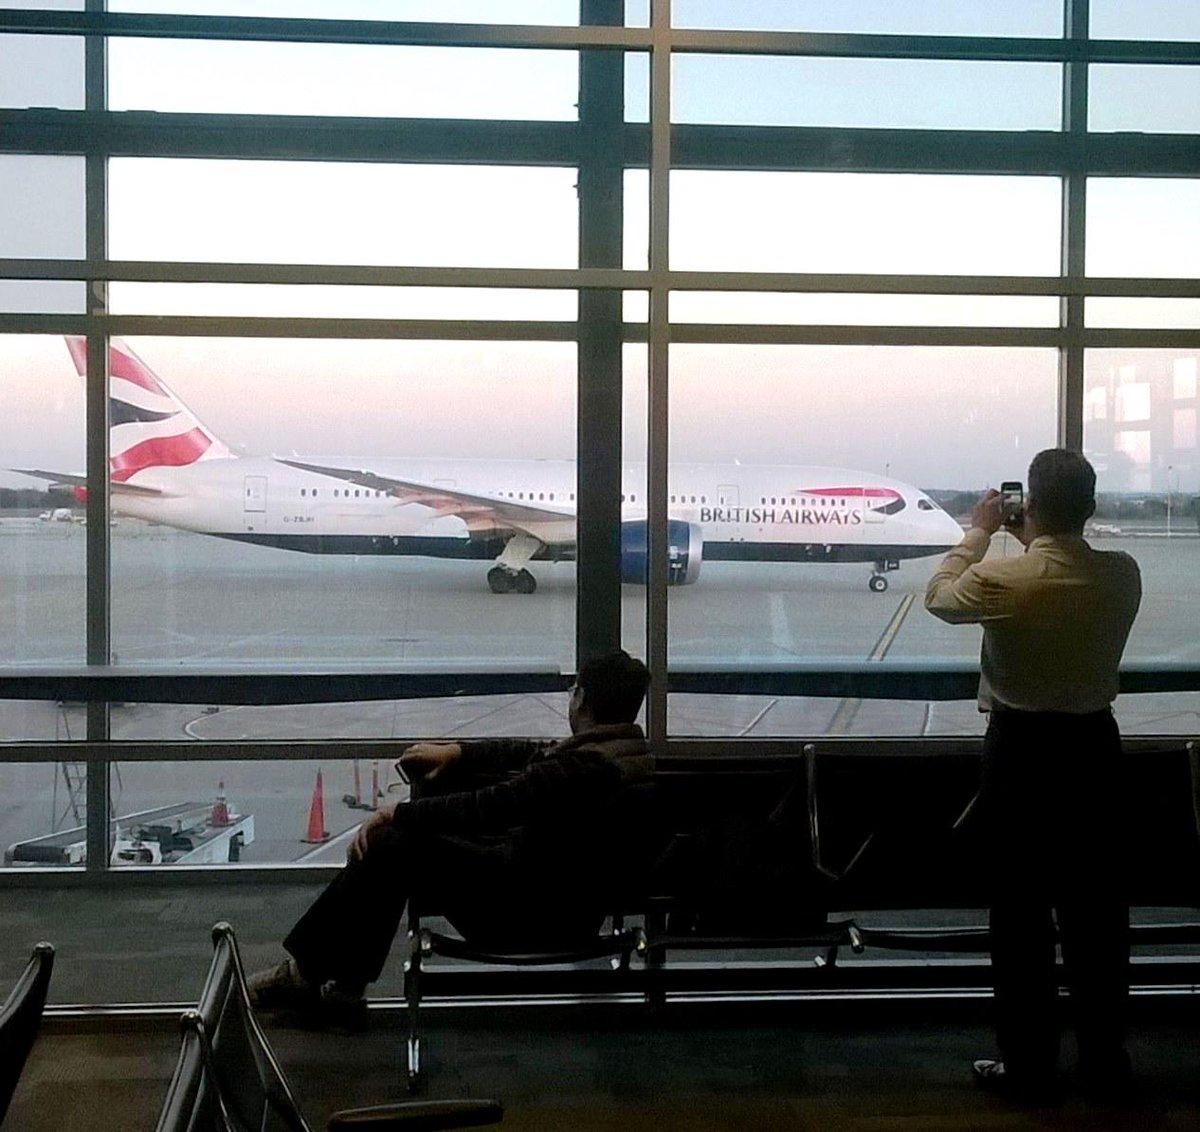 Still turning heads & posing for pics 1 year later! Happy anniversary @British_Airways AUS-@Heathrowairport nonstop! http://t.co/4LlbmwBM0L